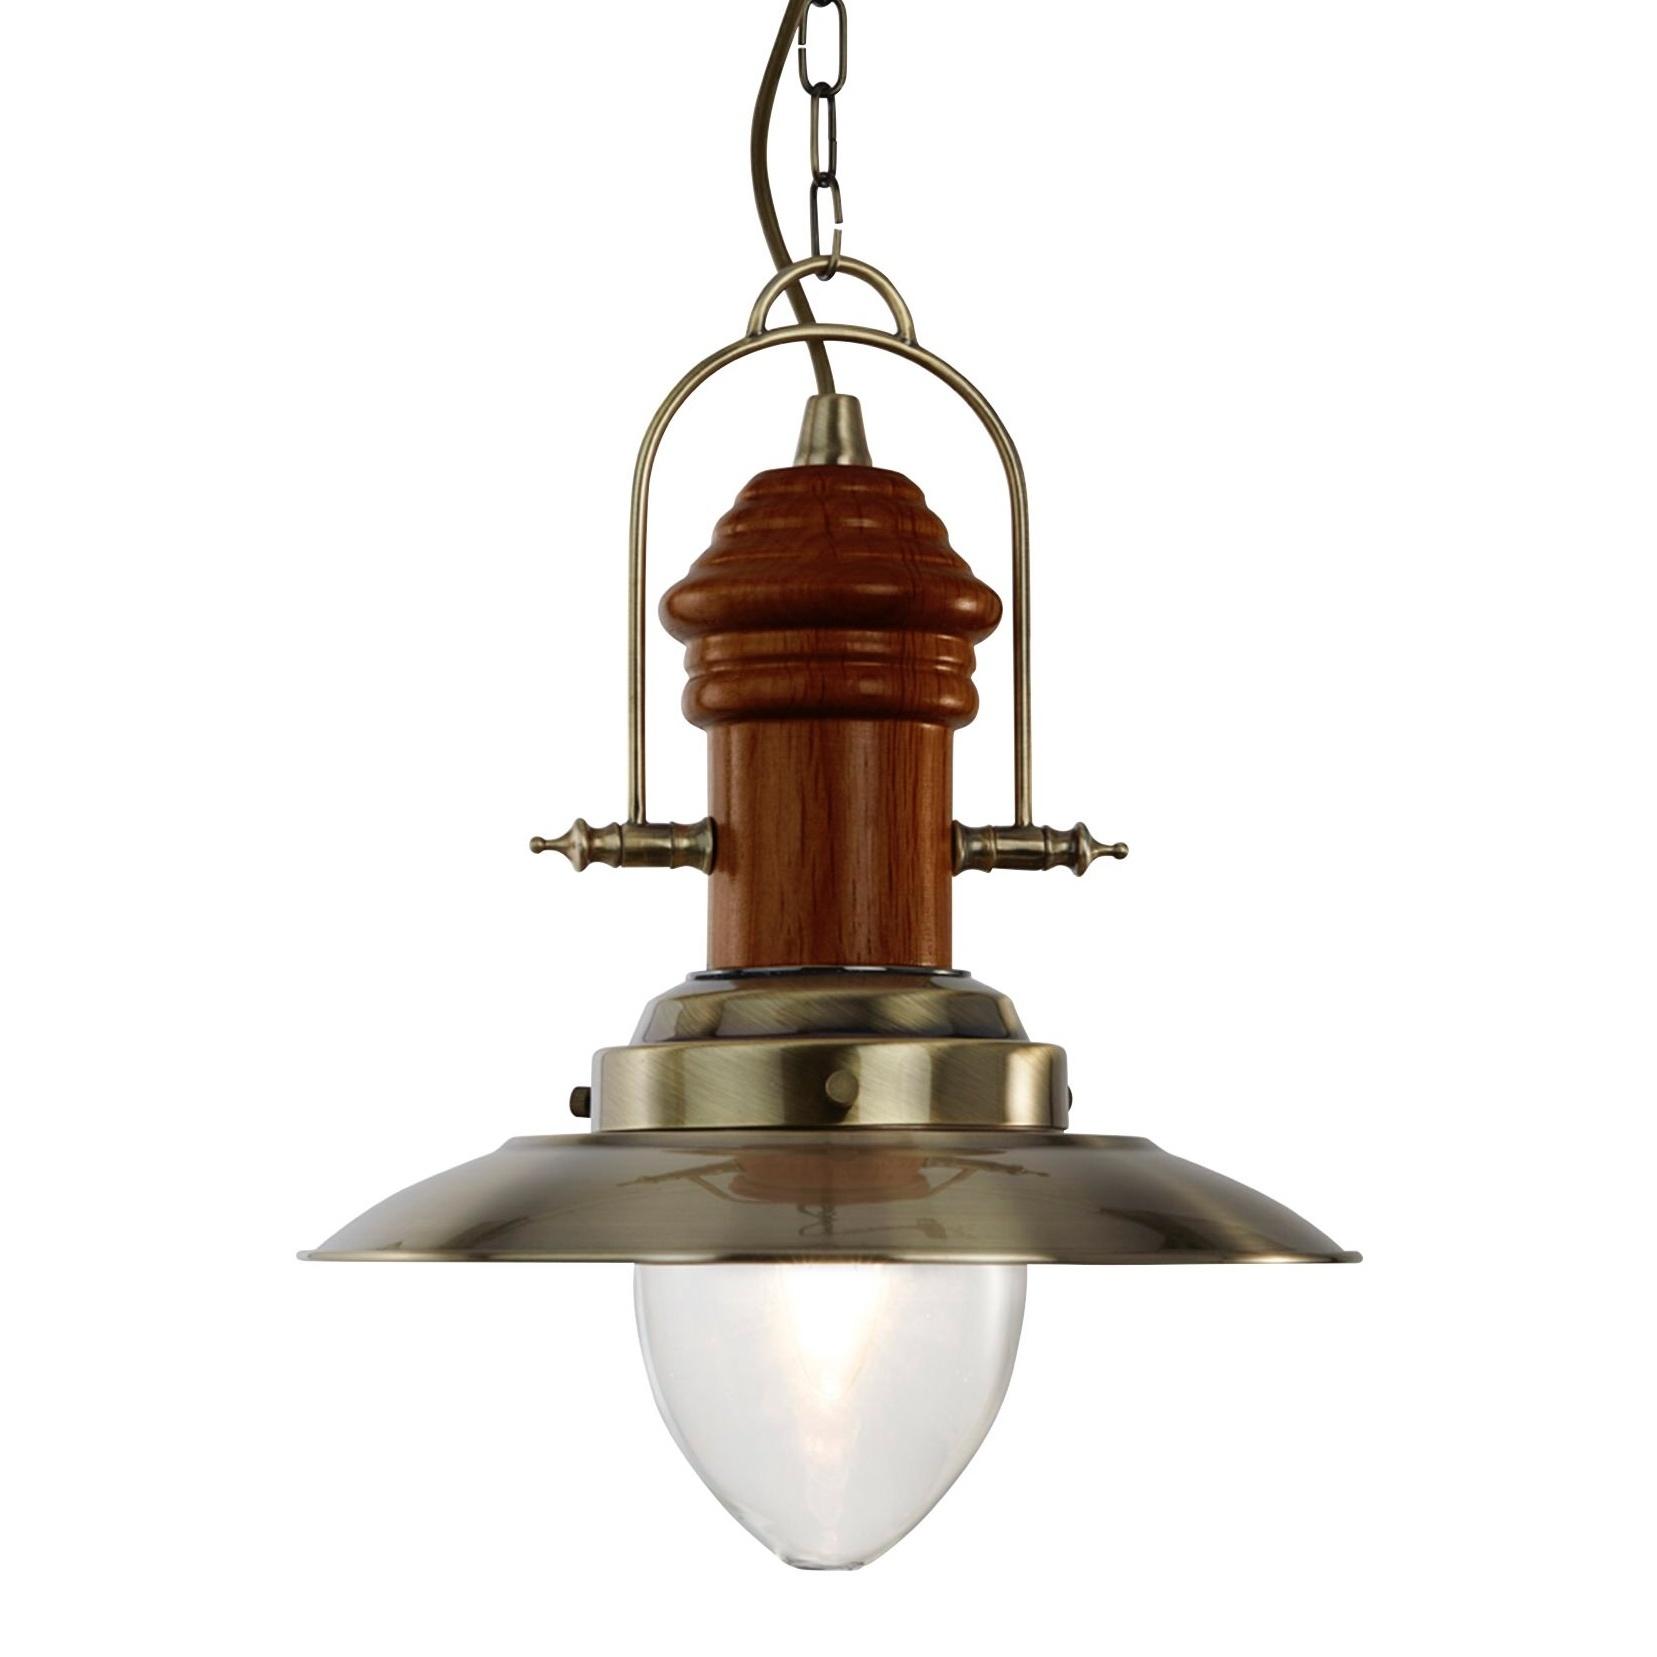 Dark Wood Brass Fishermans Lantern Lightbox